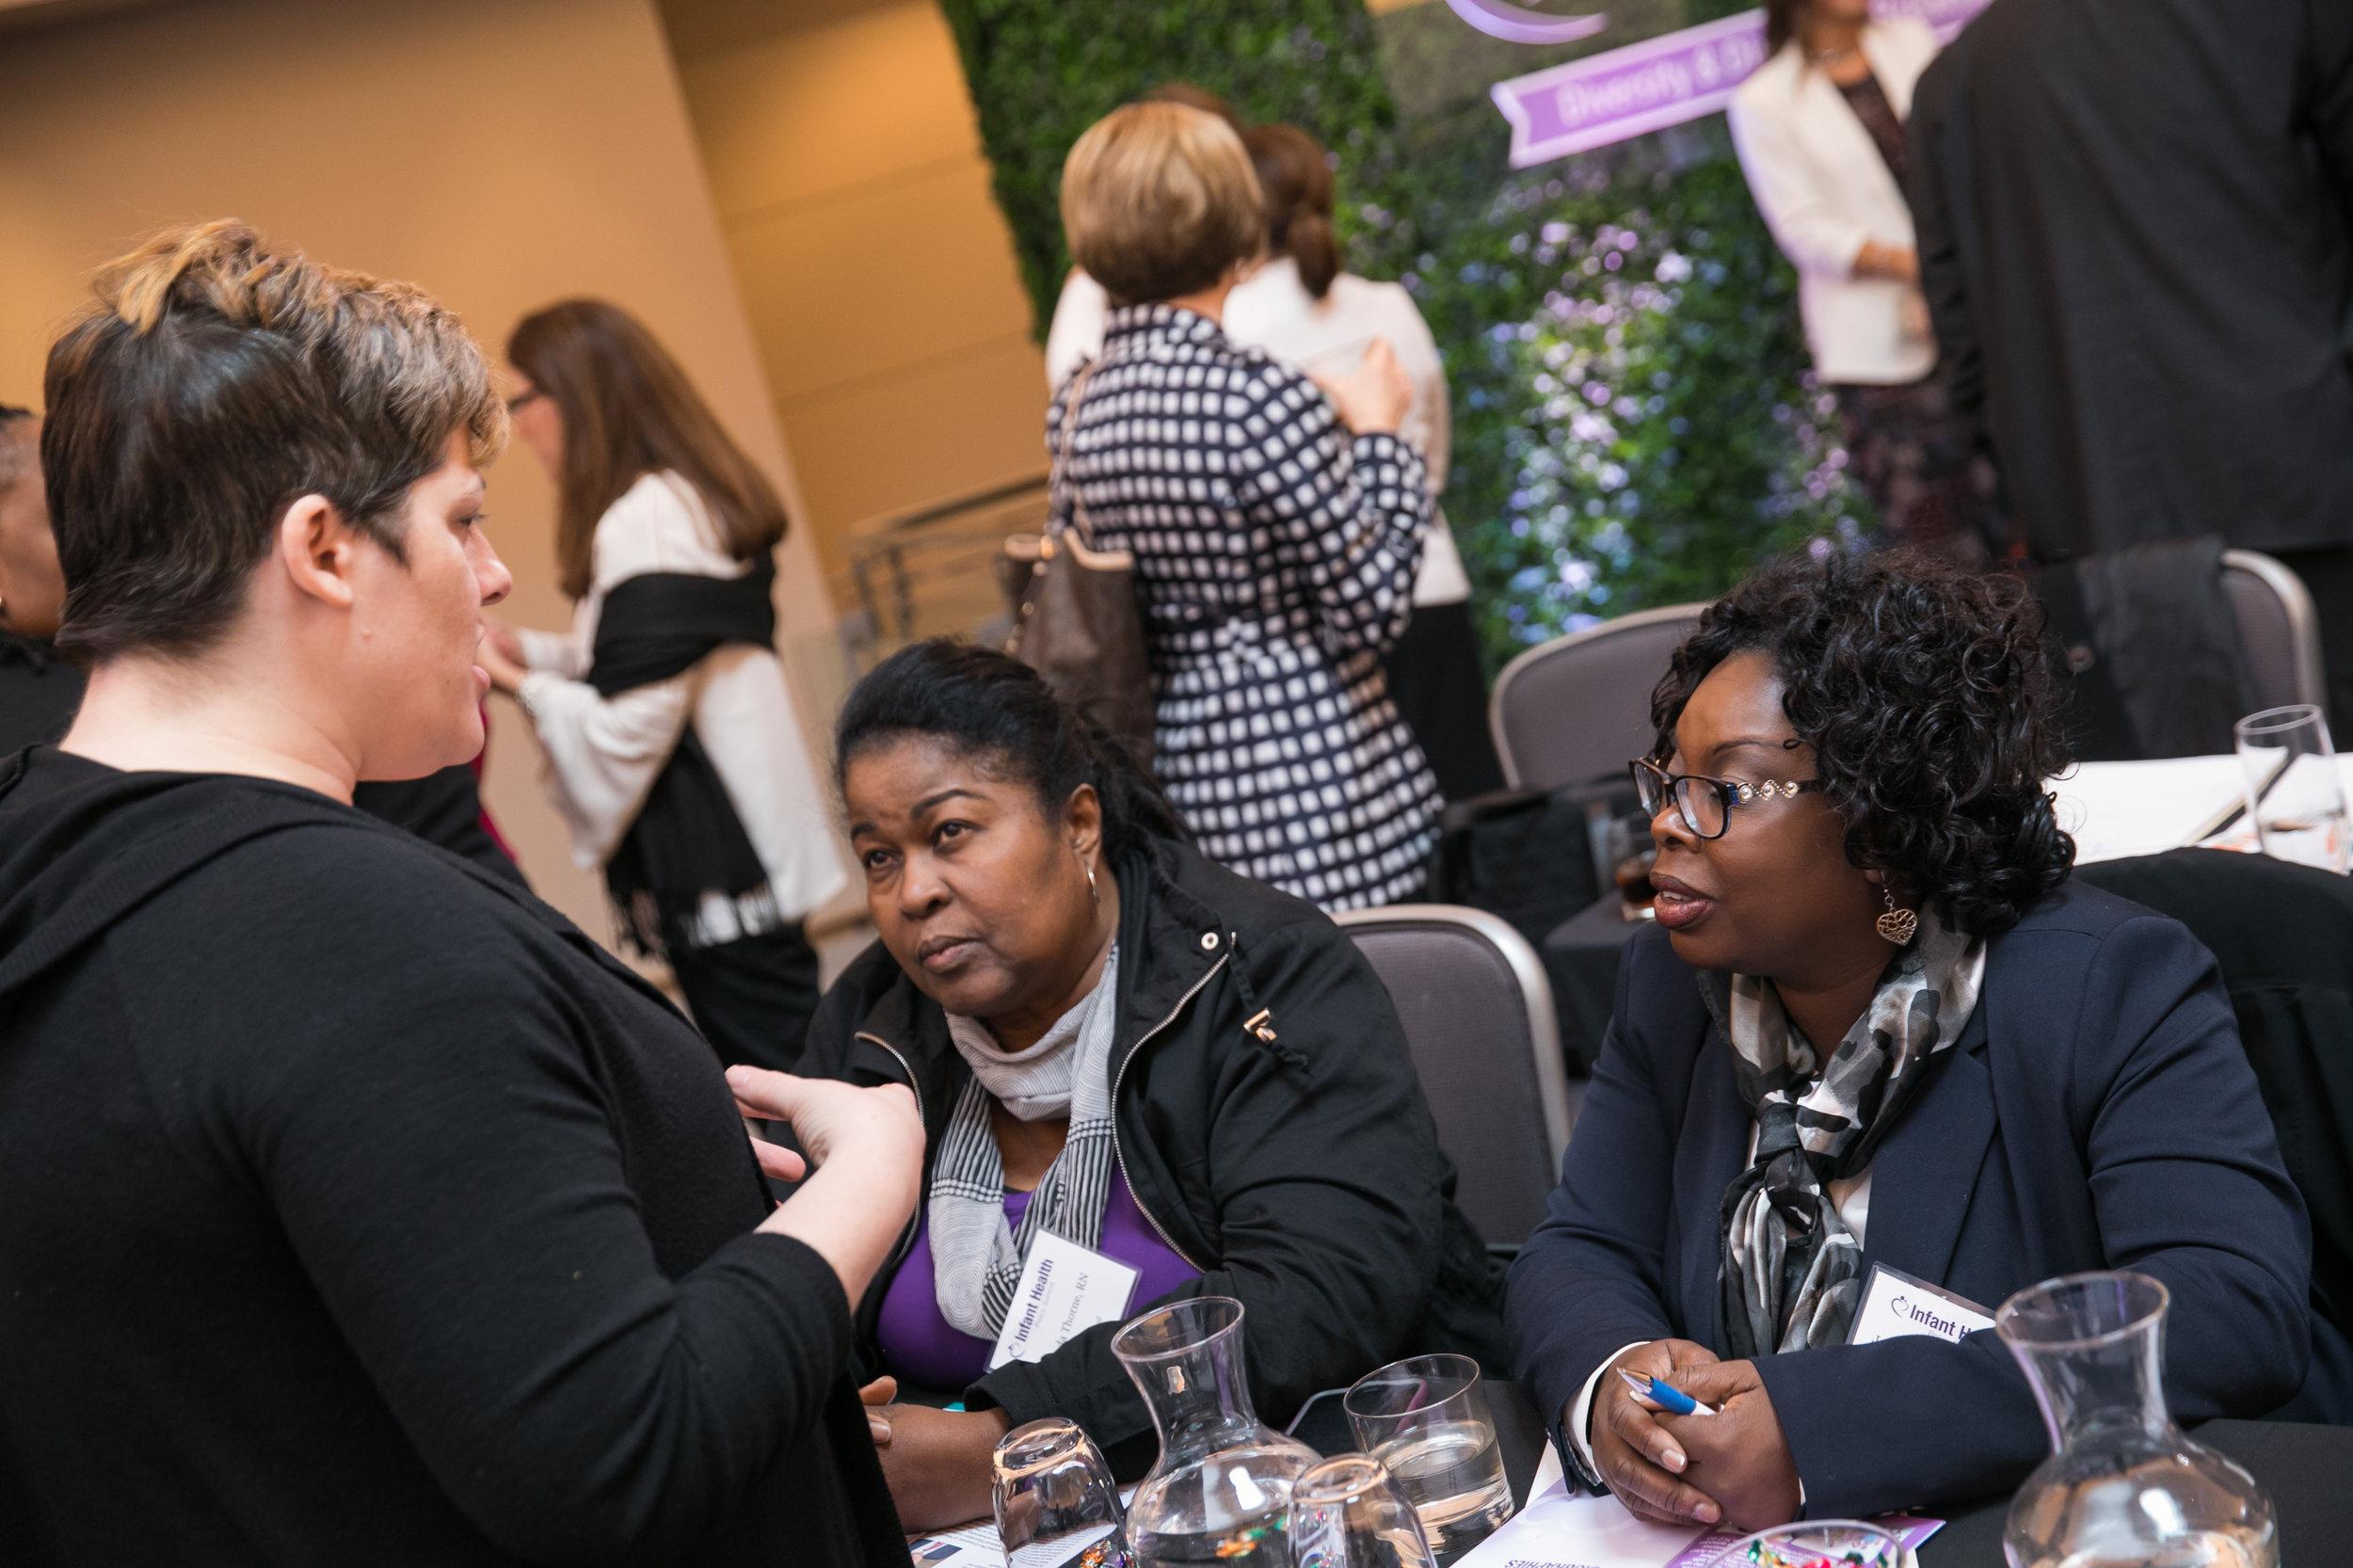 Infant Health Policy Summit - Jason Dixson Photography - 123942 - 0643.jpg